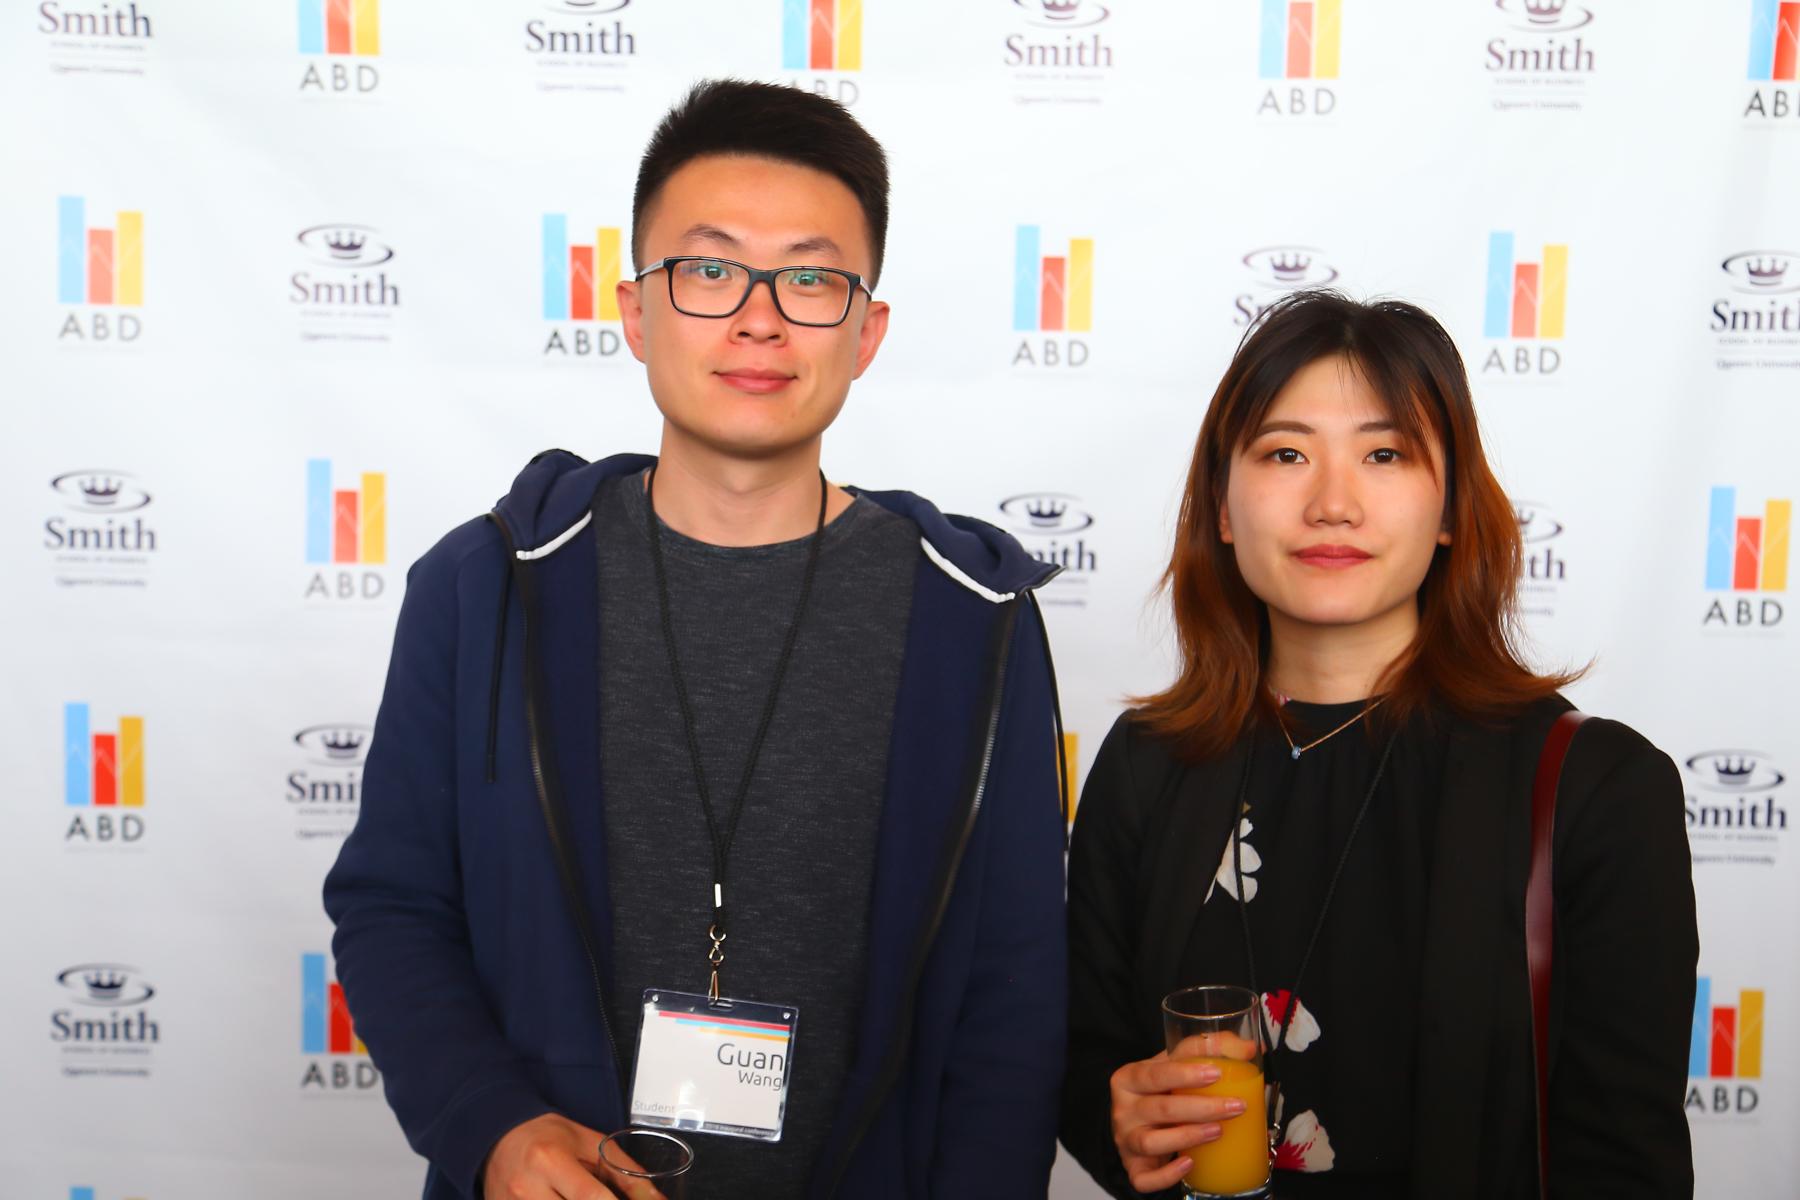 ABD_Conference_2018-023.jpg